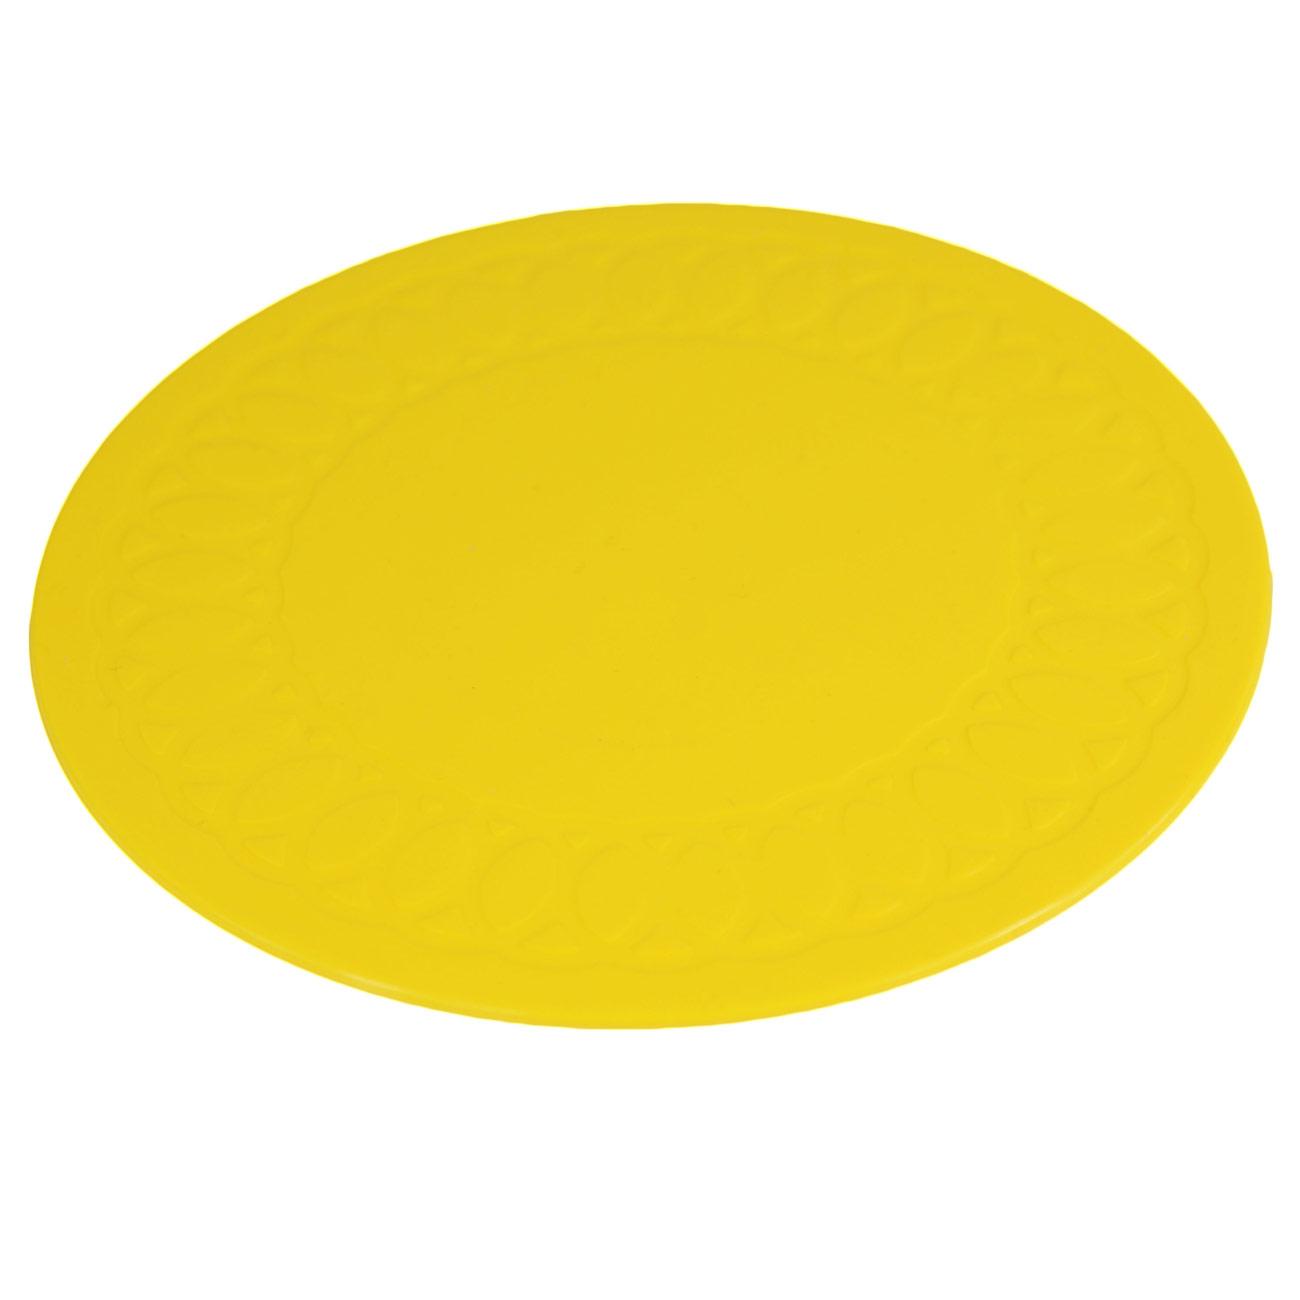 Tenura Non-Slip Coaster - Yellow